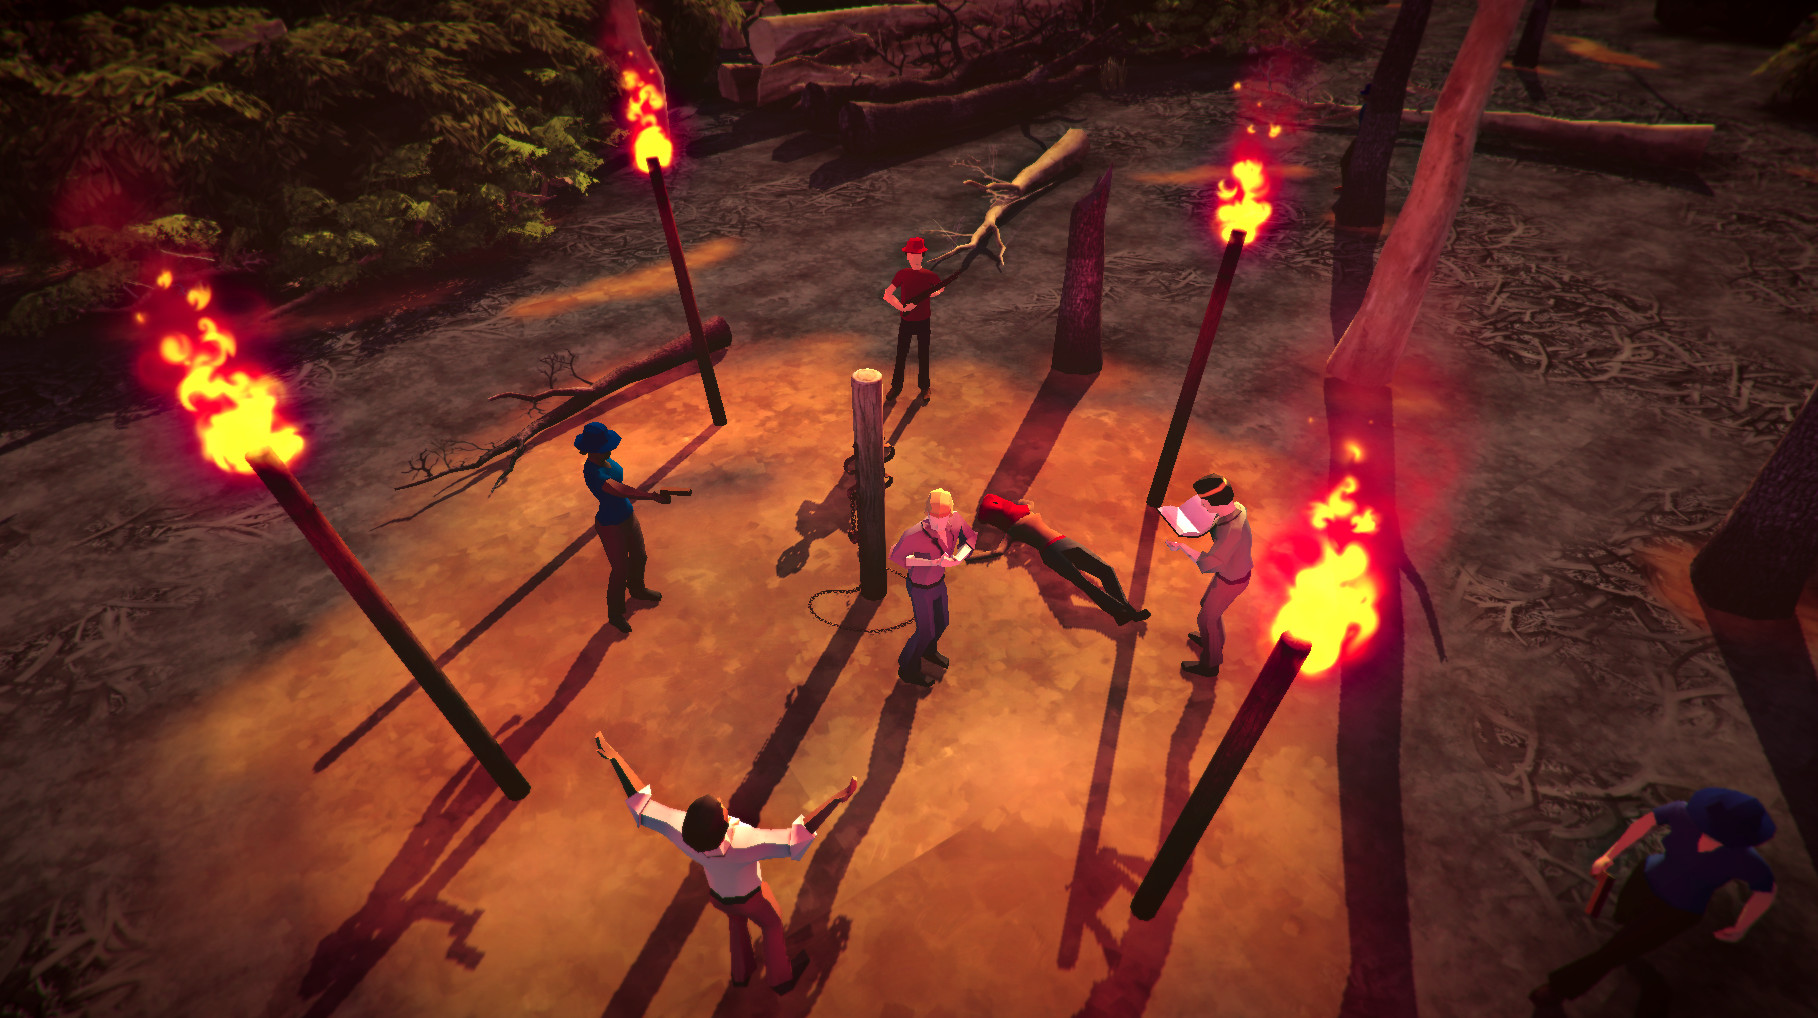 Fami通游戏评分 《女神异闻录5R》37分荣登白金